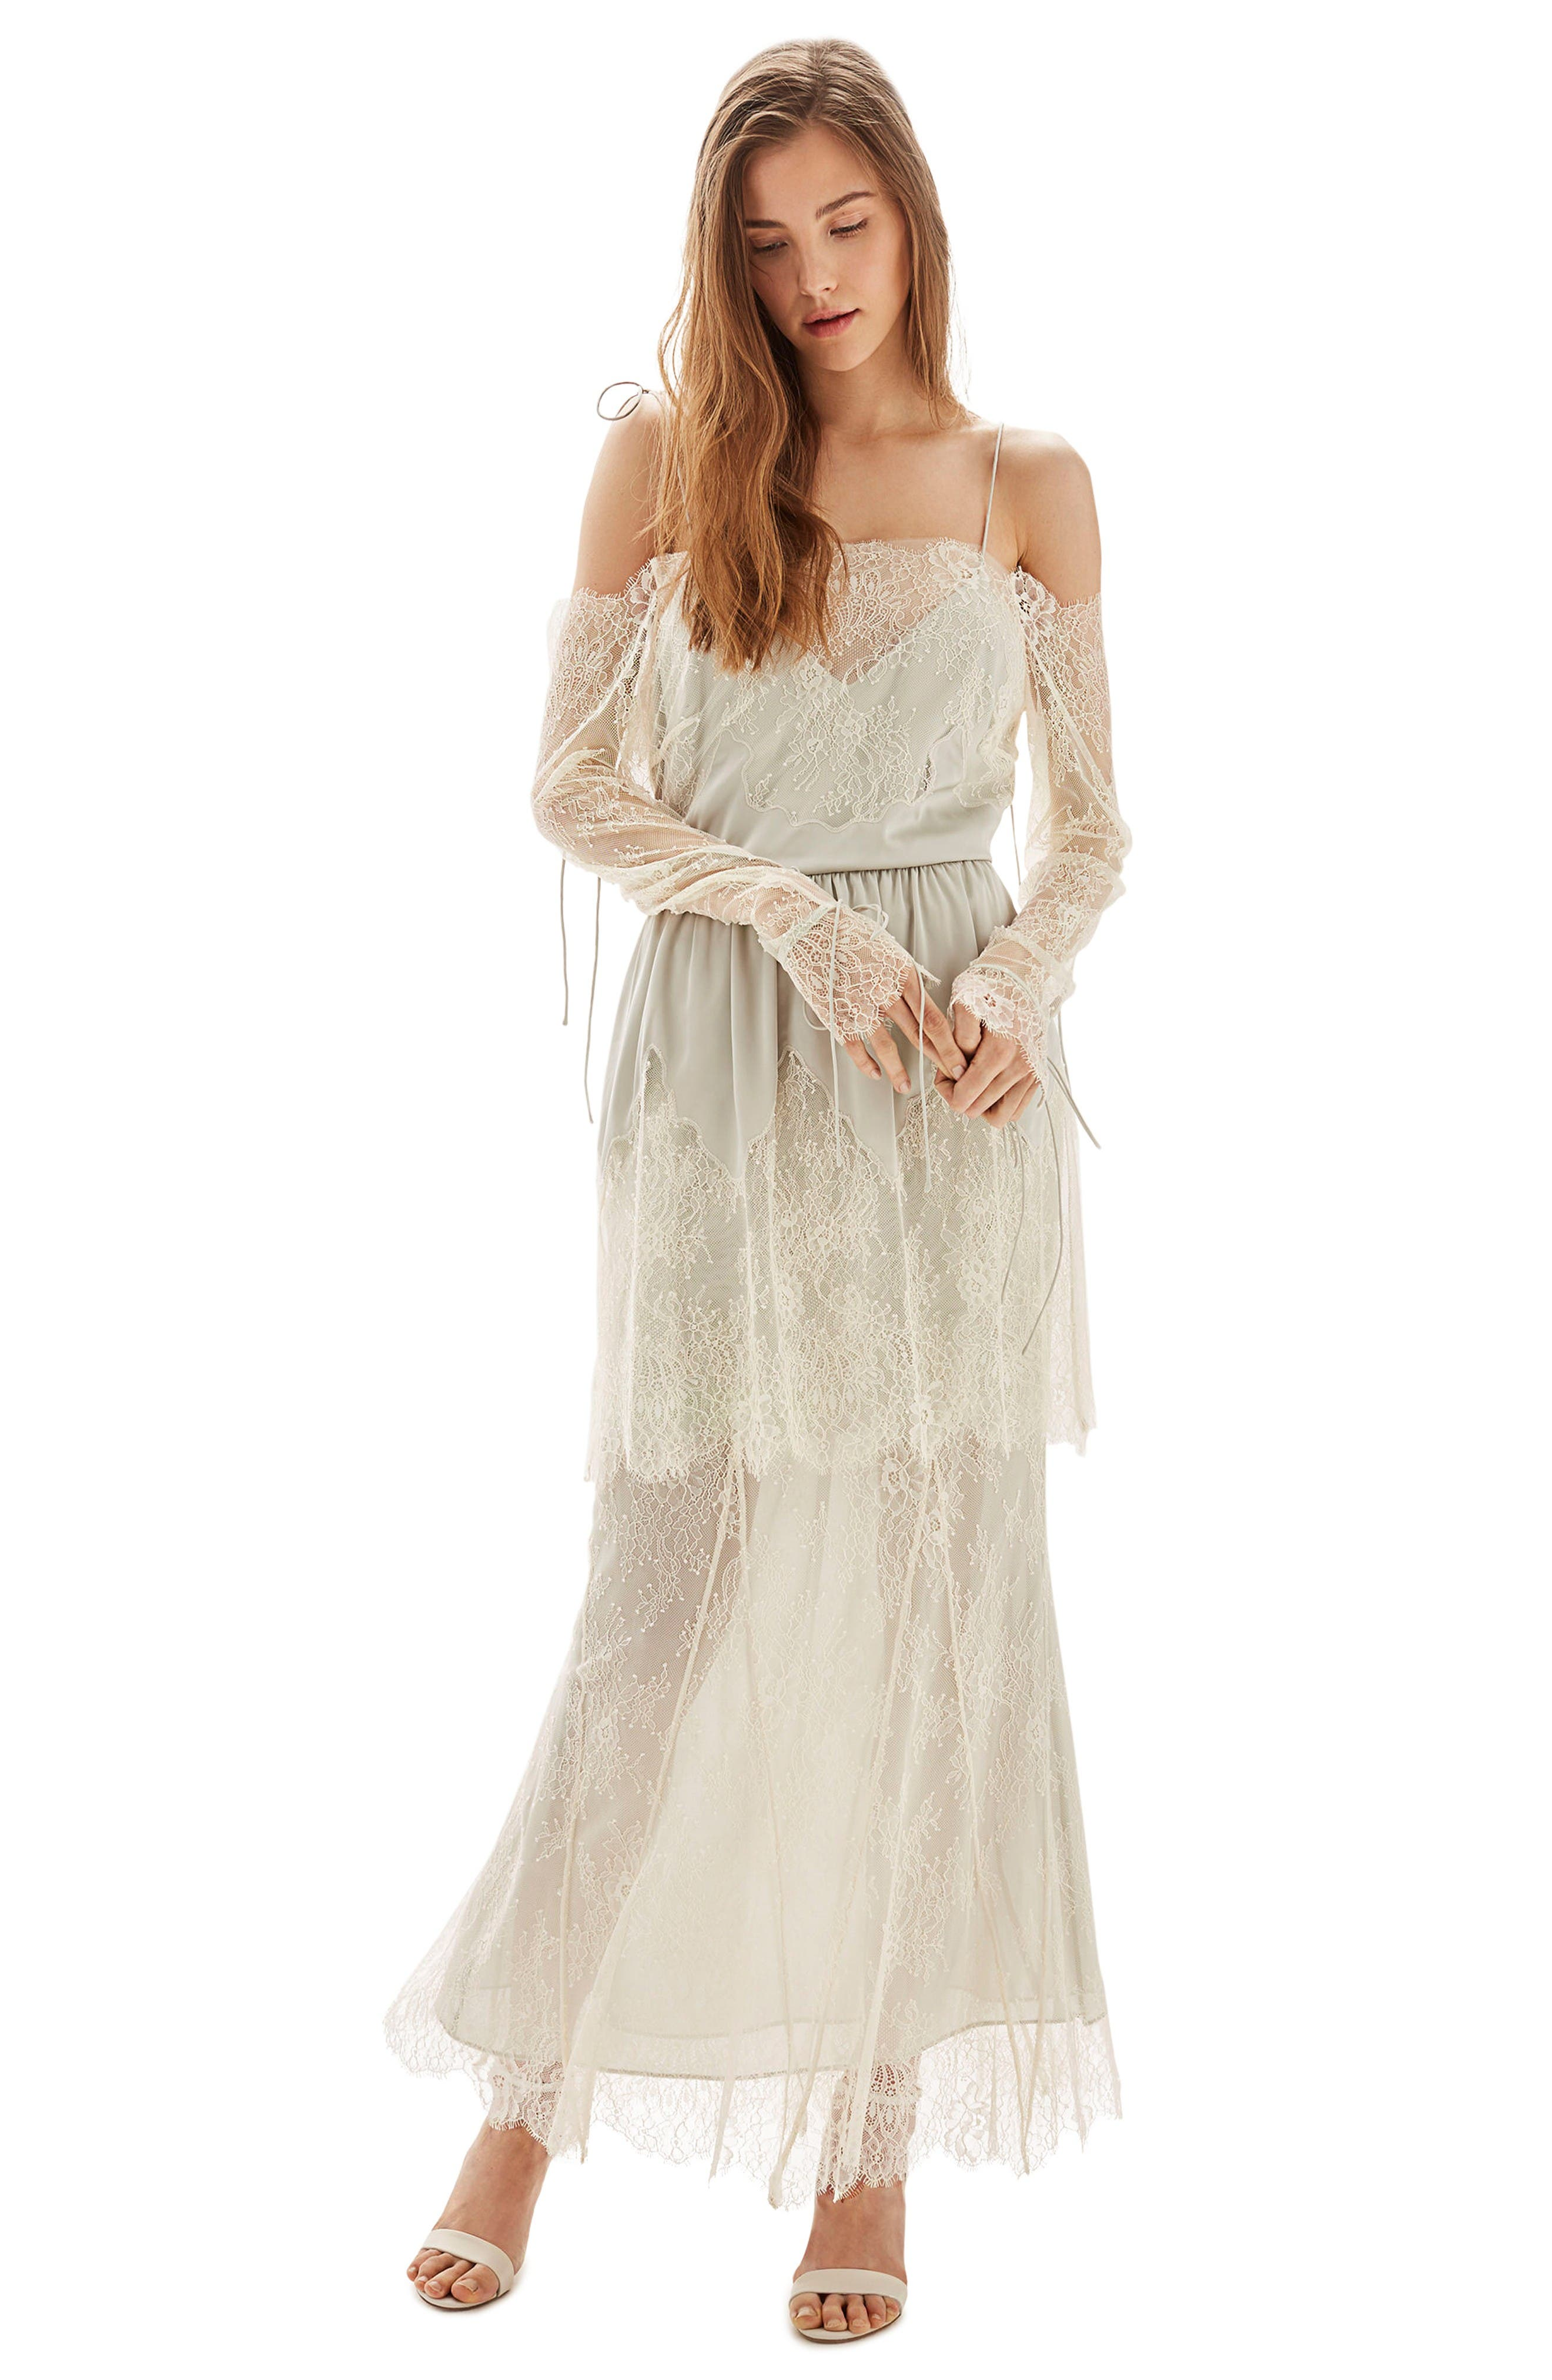 Bride Bardot Lace Off the Shoulder Gown,                             Main thumbnail 1, color,                             Ivory